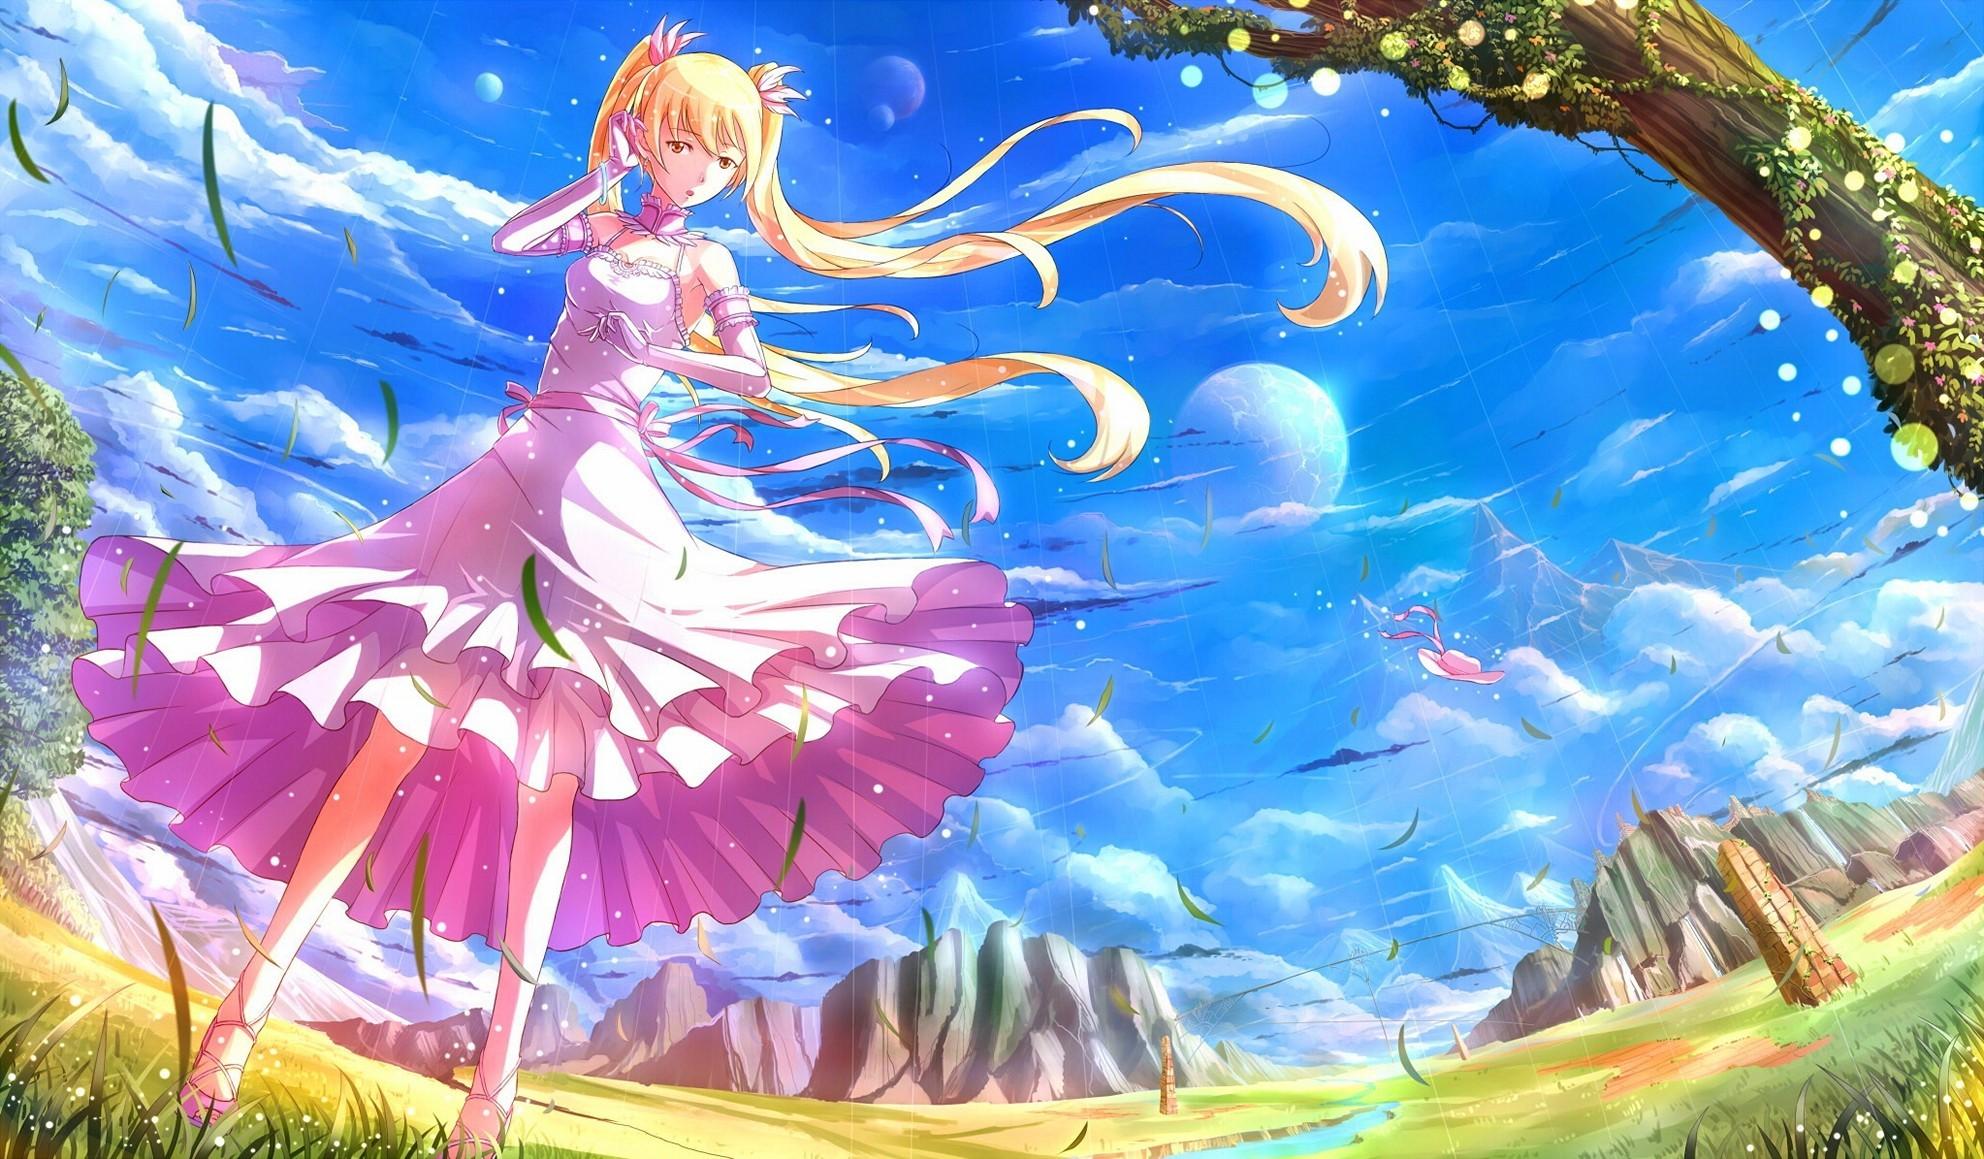 Girl Hair Blonde Nature Wind Inspired Live Anime Wallpaper